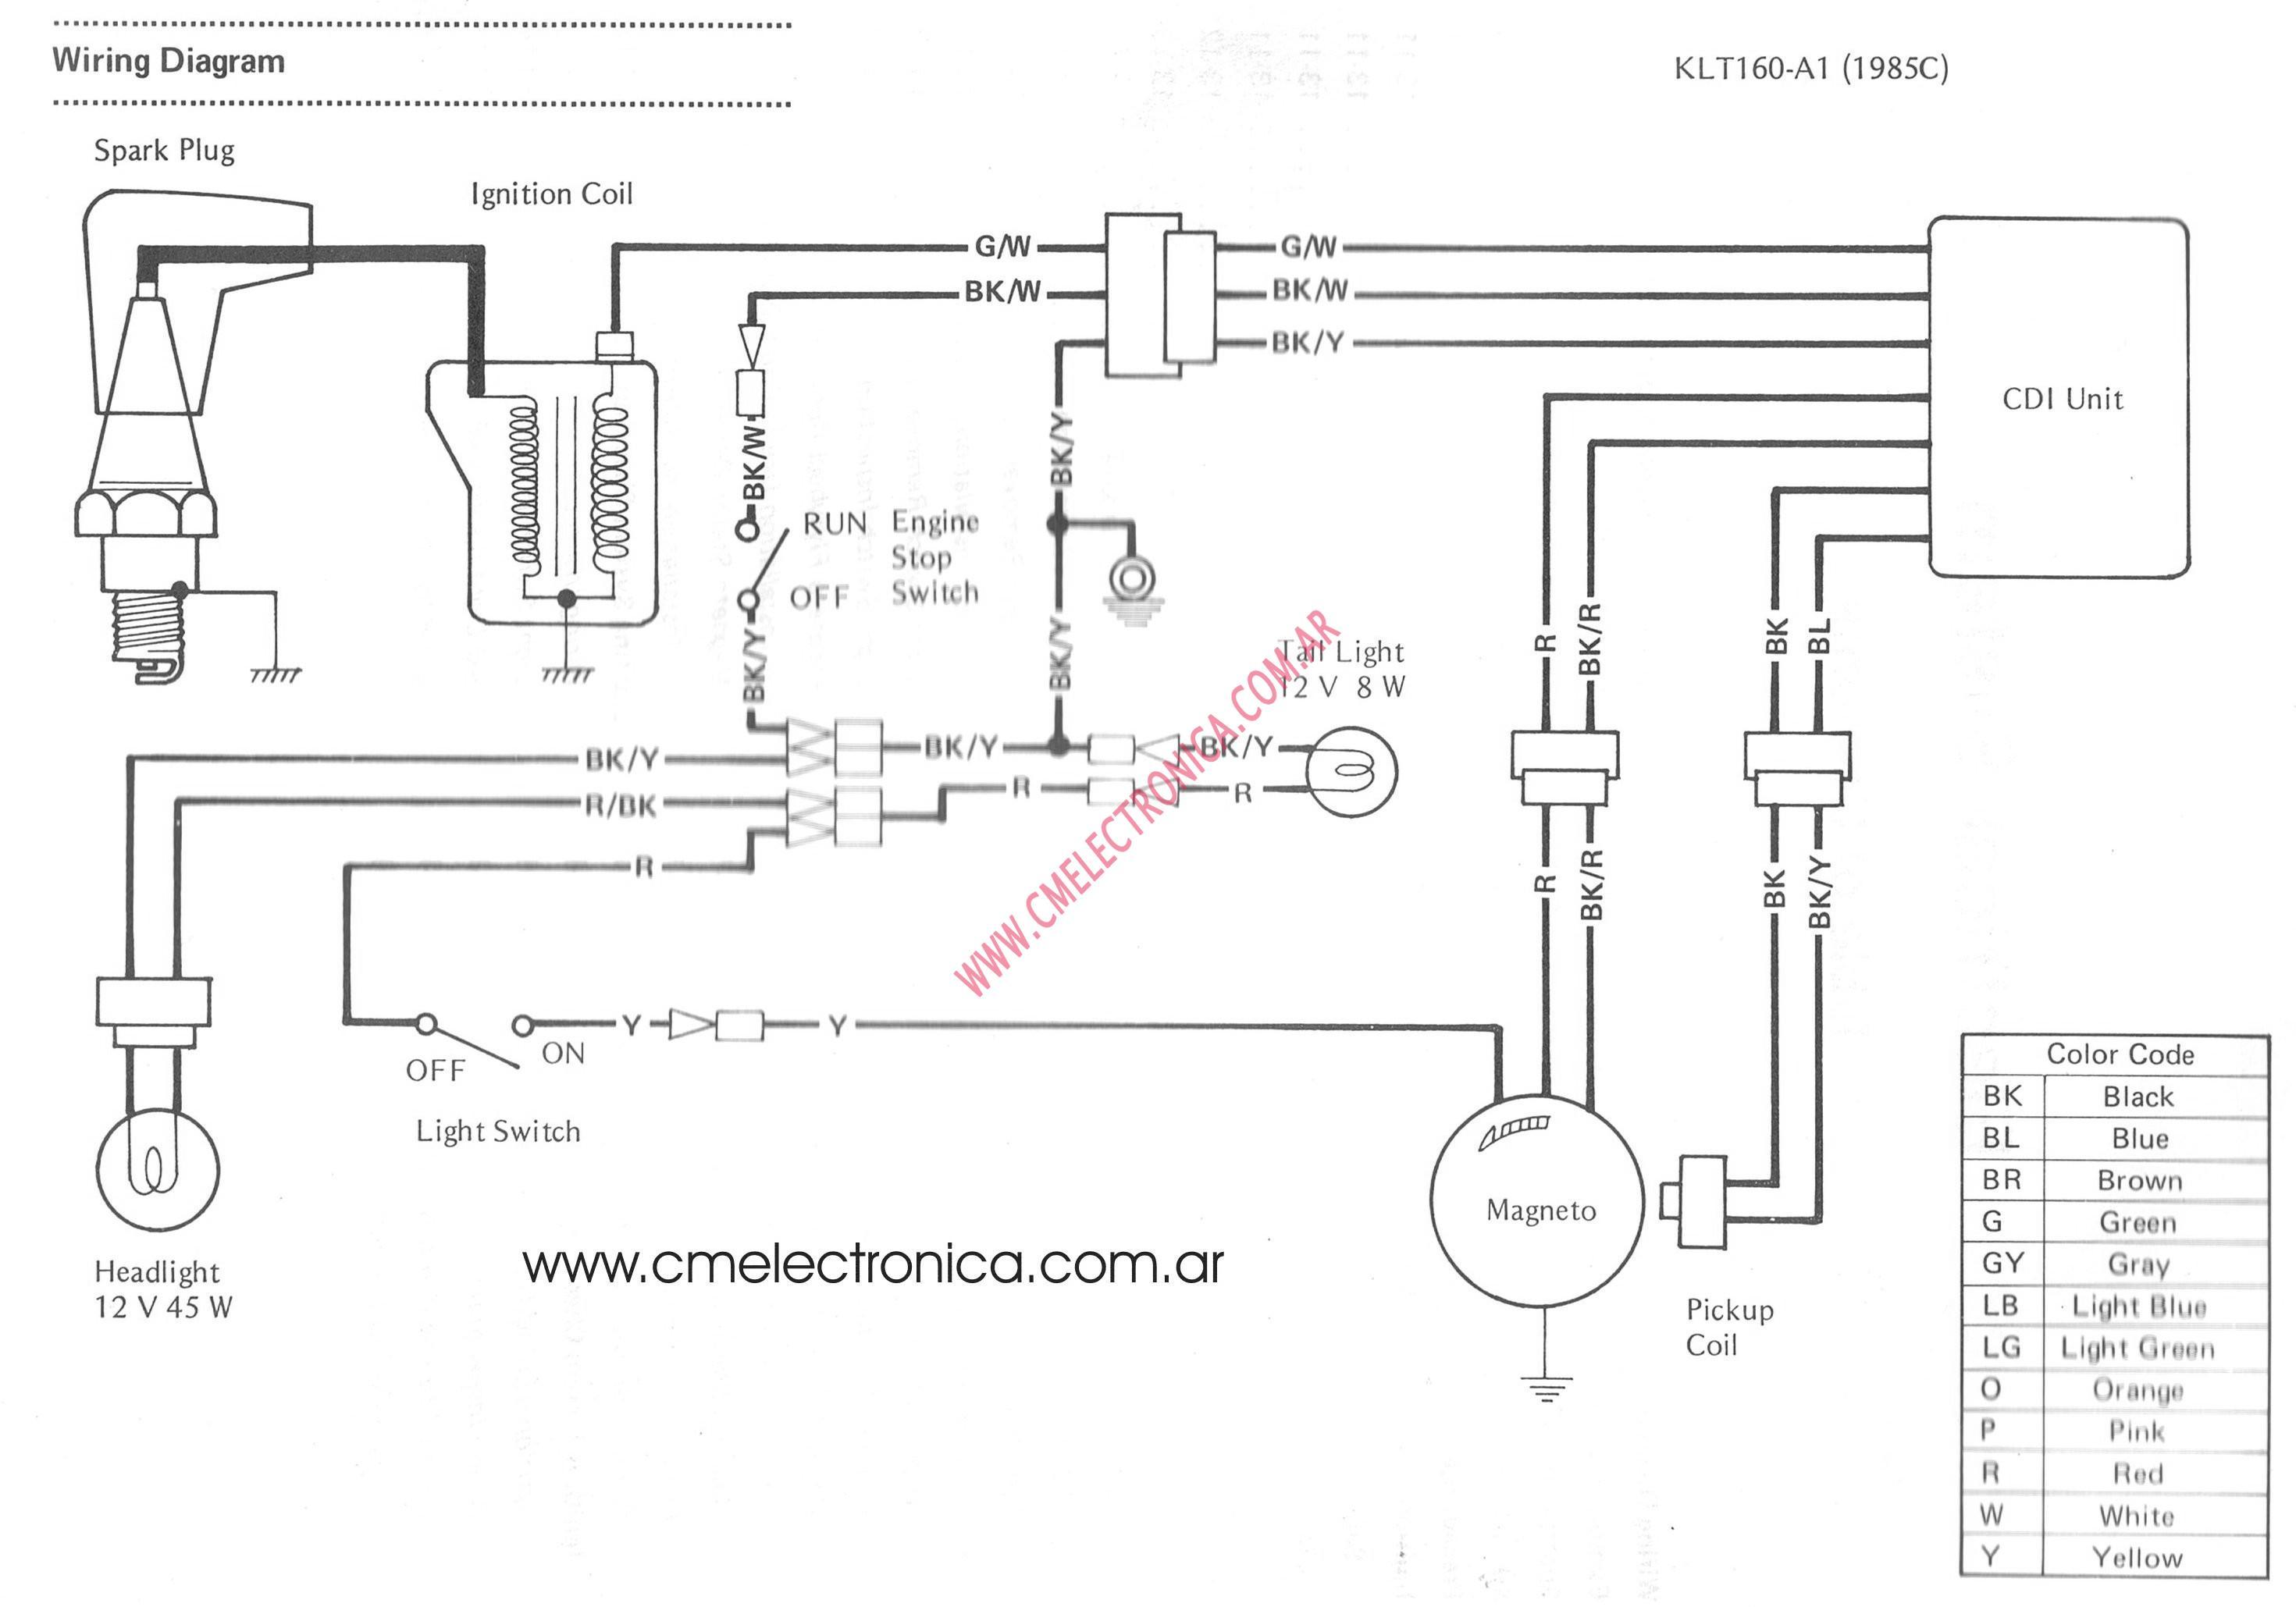 BS_6621] Kawasaki Kmx 125 Wiring Diagram Download DiagramEtic Simij Phae Mohammedshrine Librar Wiring 101